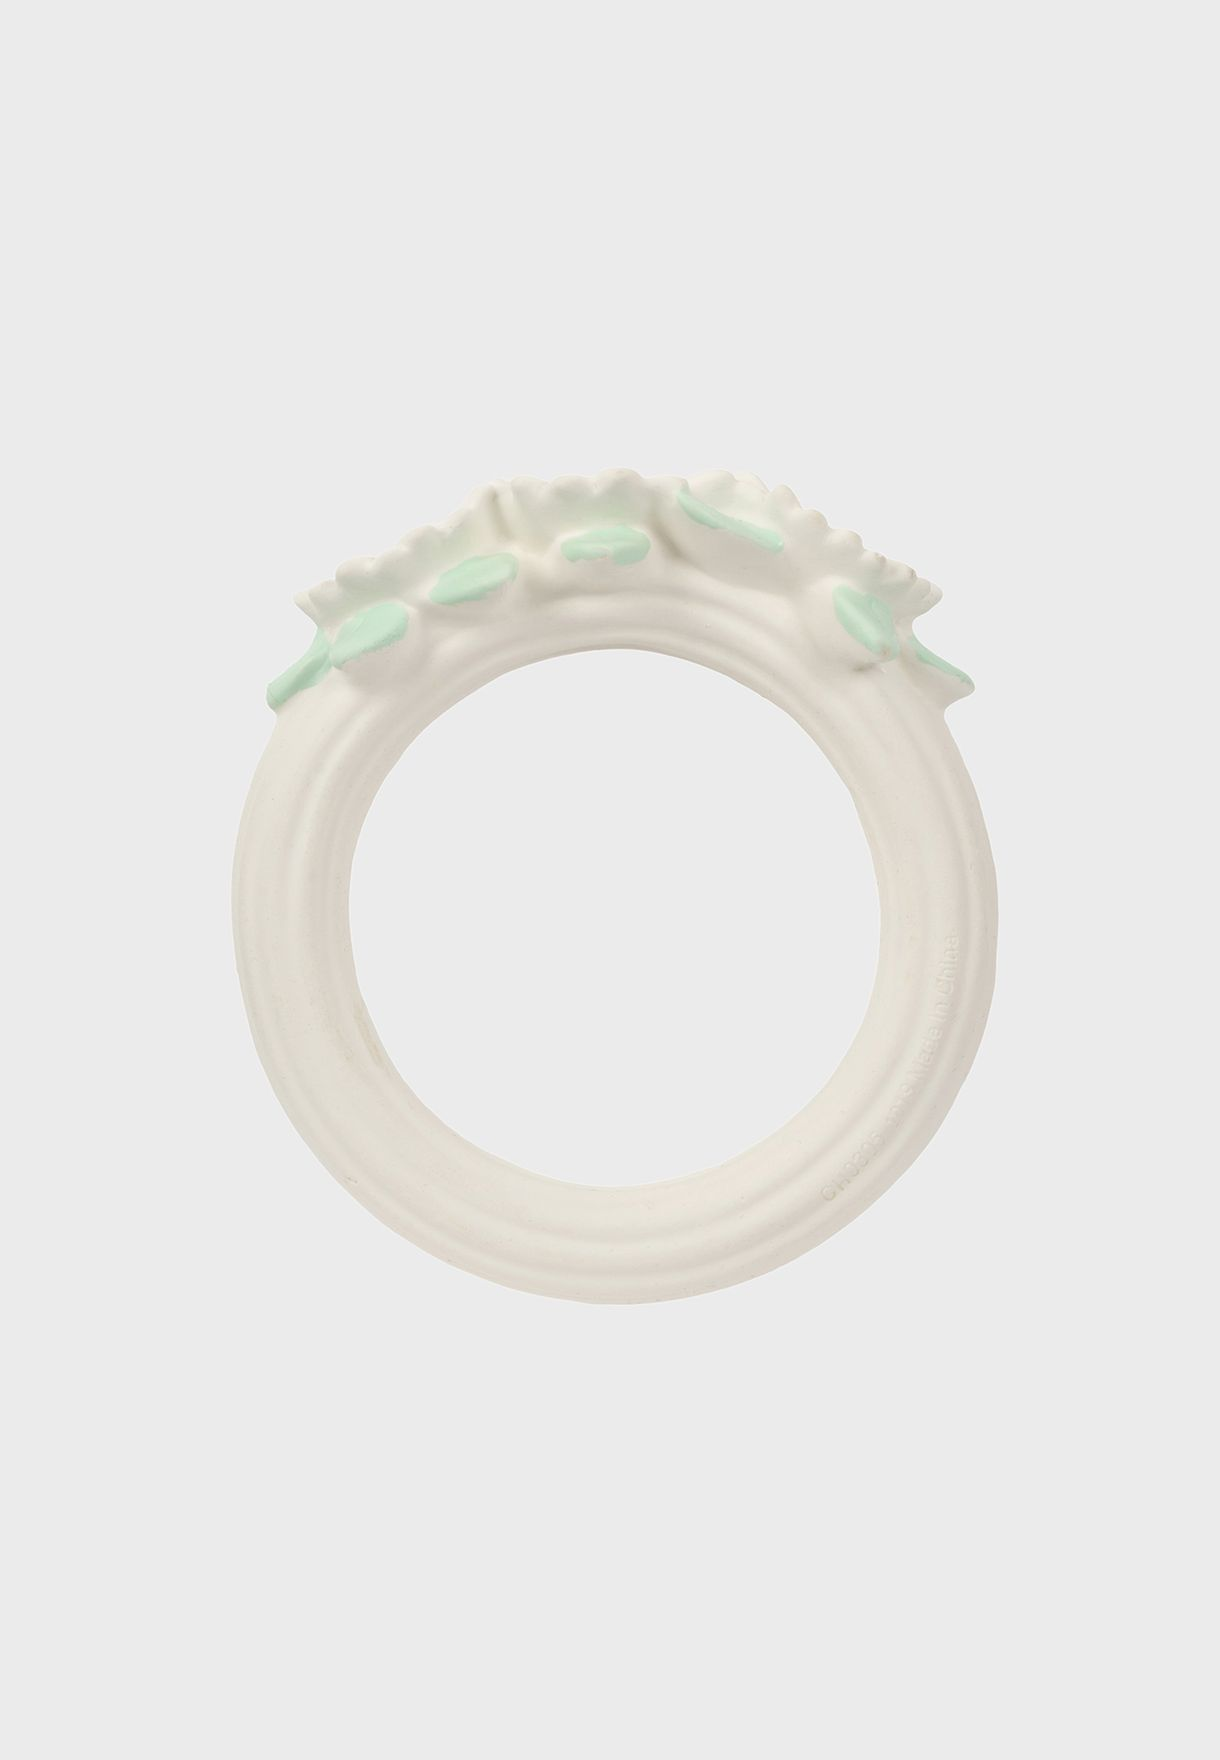 Daisy Chain Teething Ring